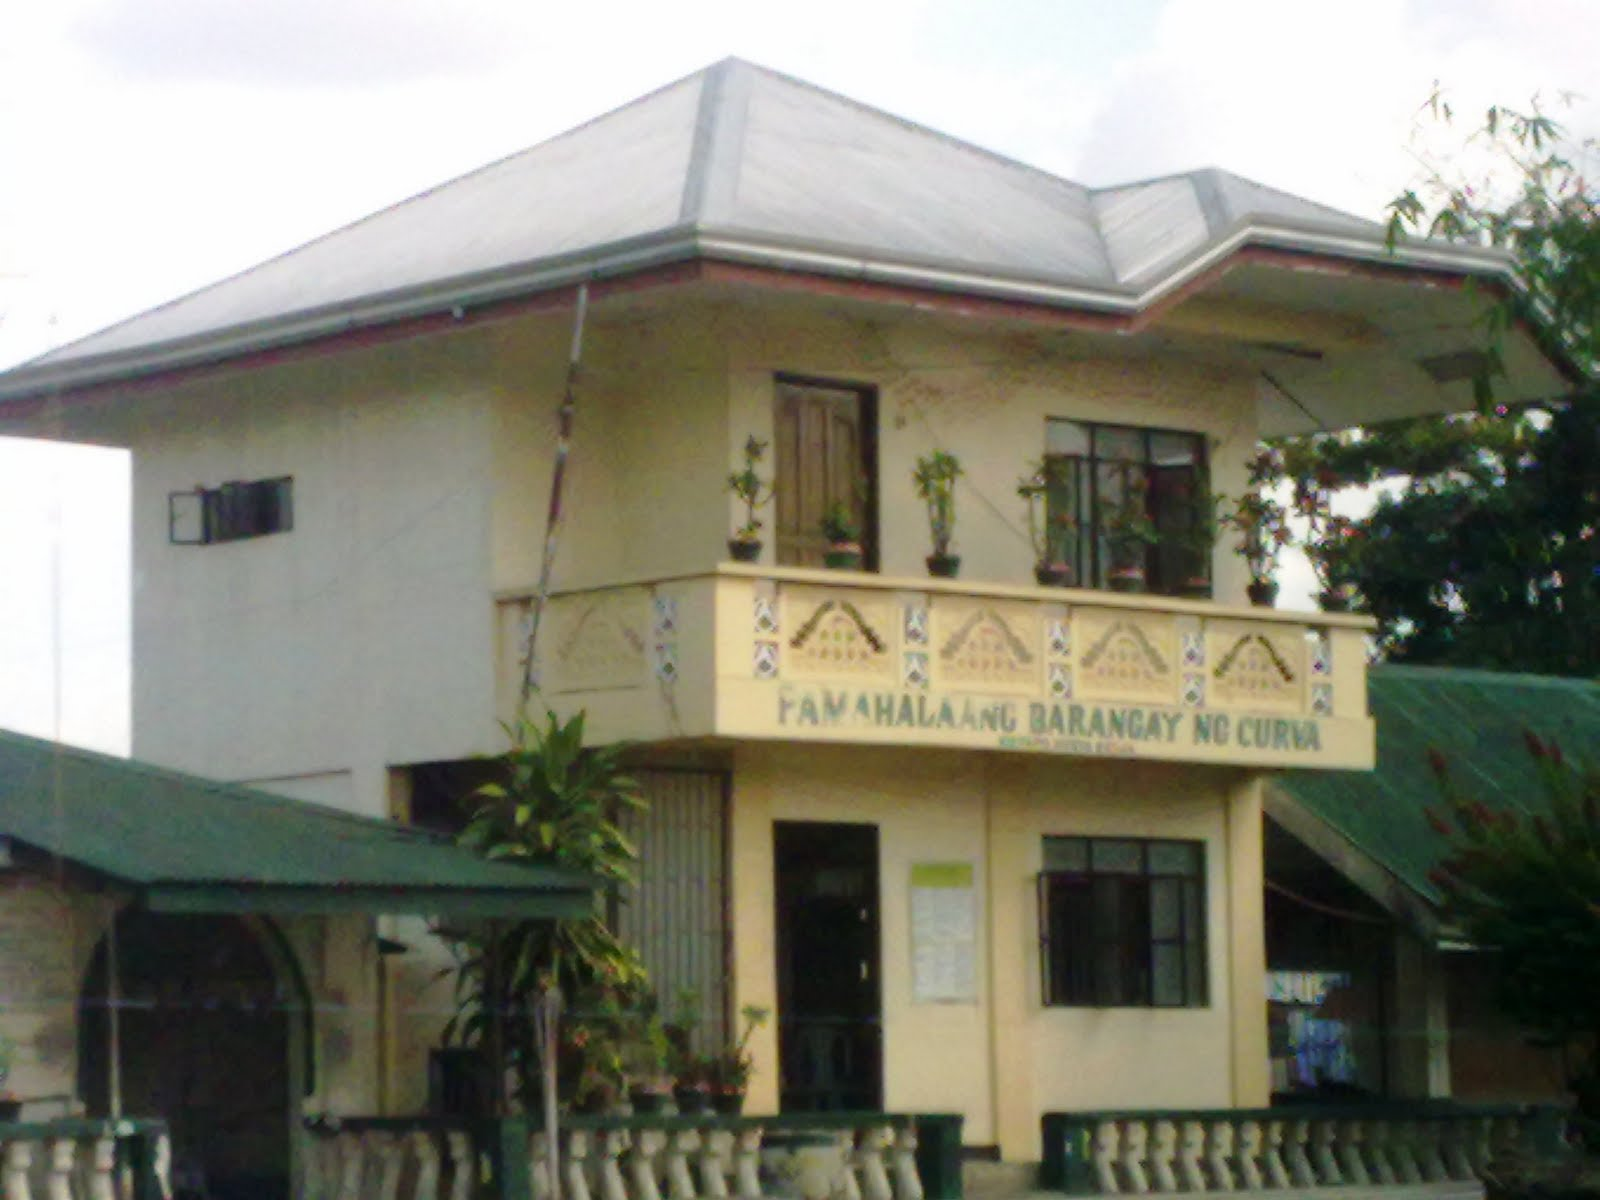 barangay profile 1 malapok Municipality of binangonan has a total of 40 barangays, 23 mainland and 17 island barangays.